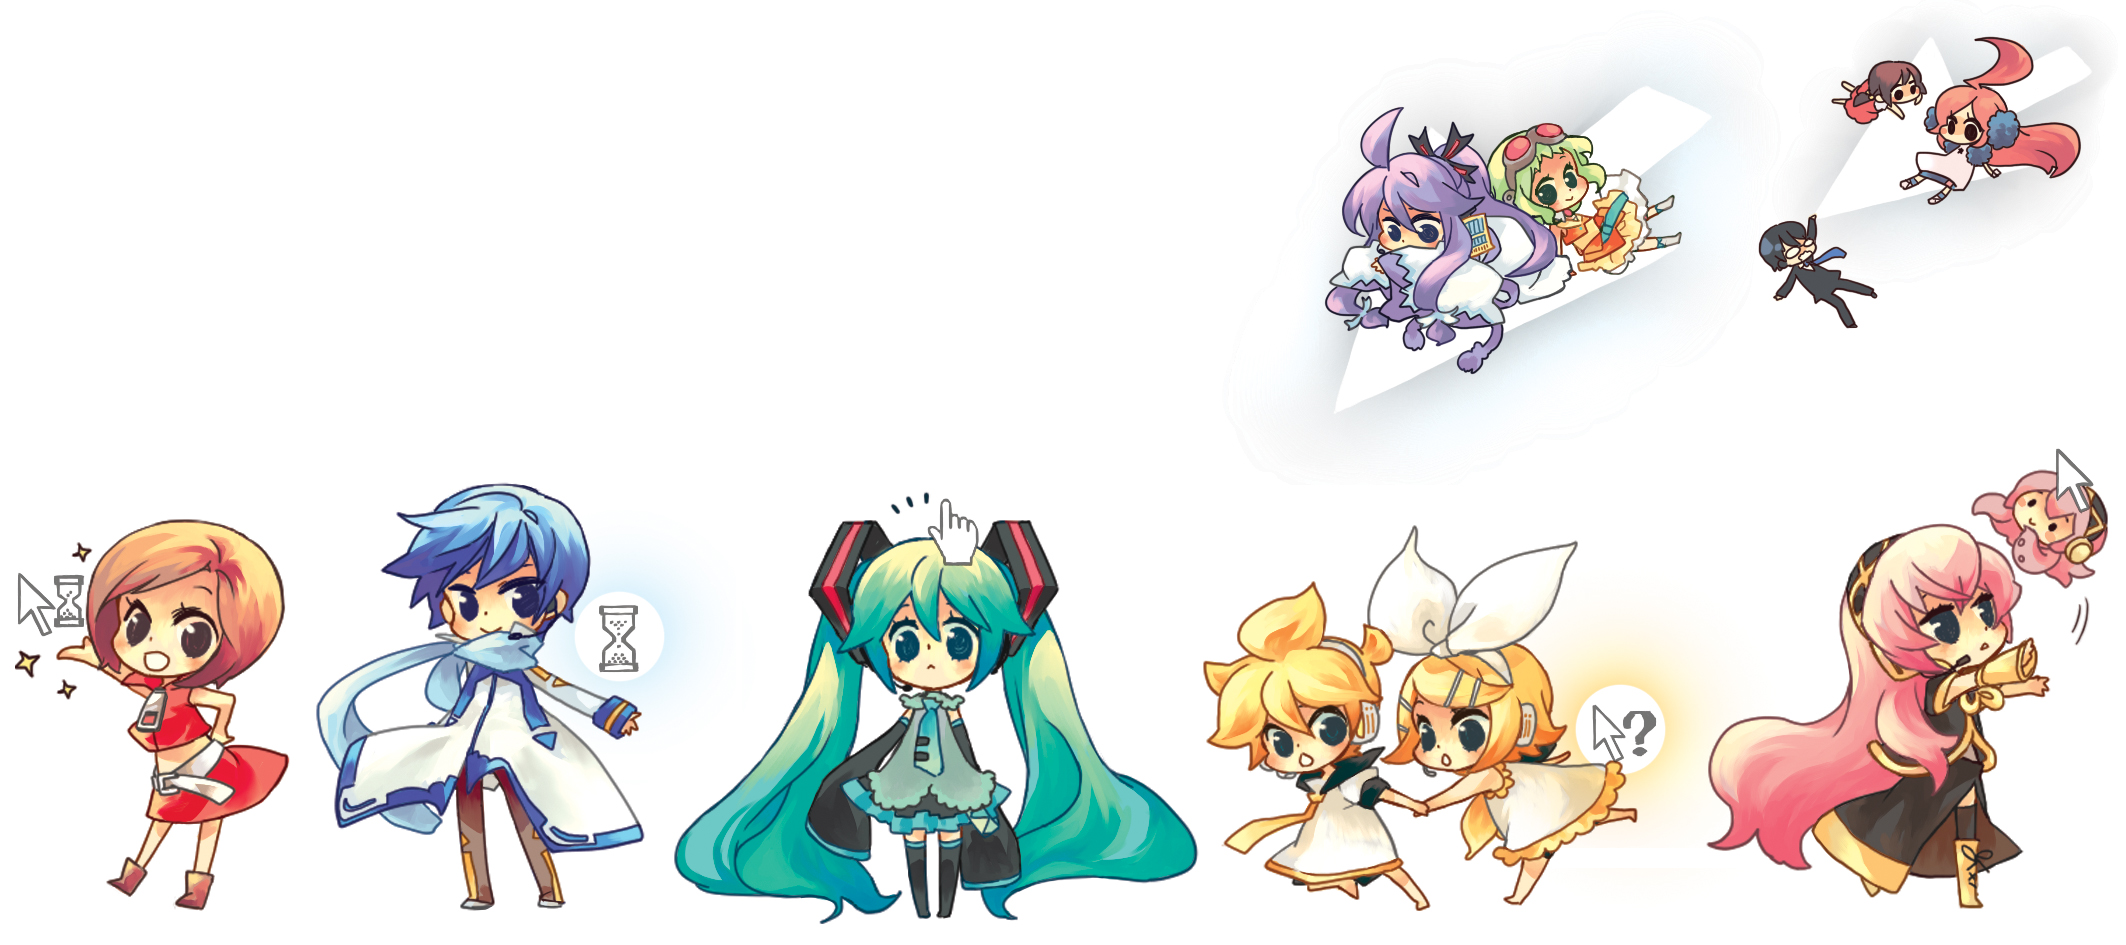 Vocaloid Chibi Group Wallpaper VOCALOID Image #141211...